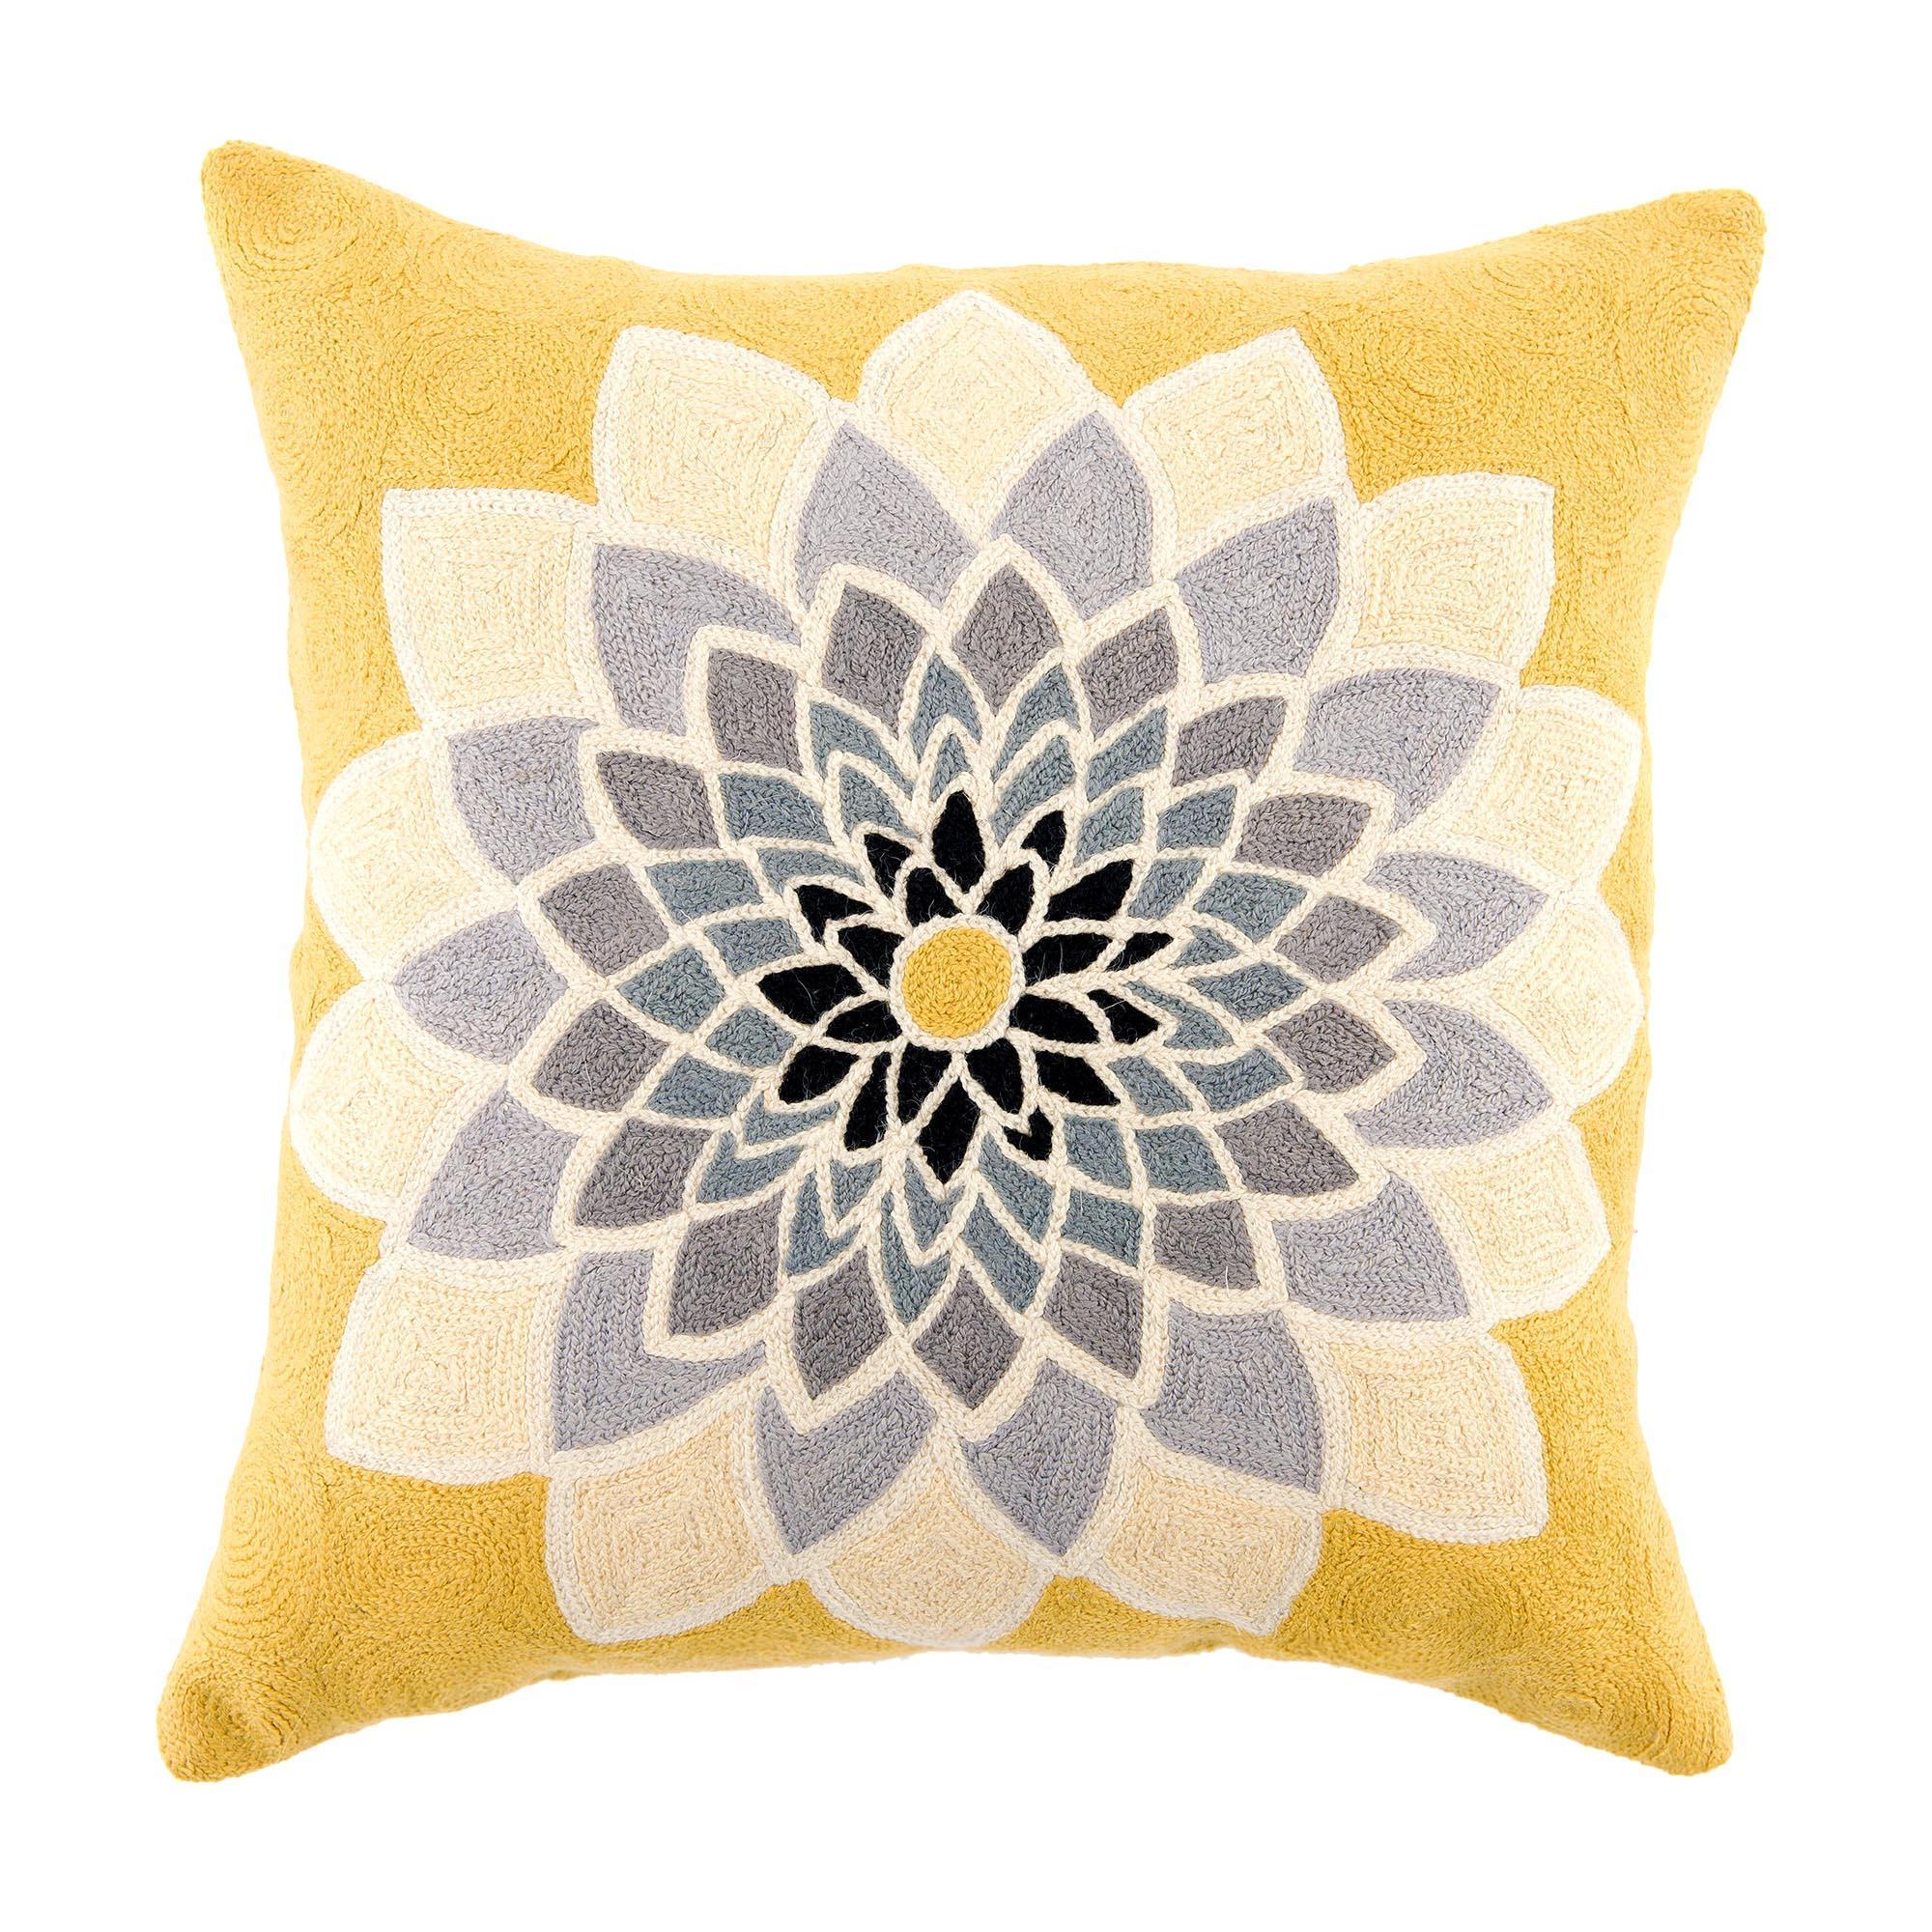 Flowering Cushion